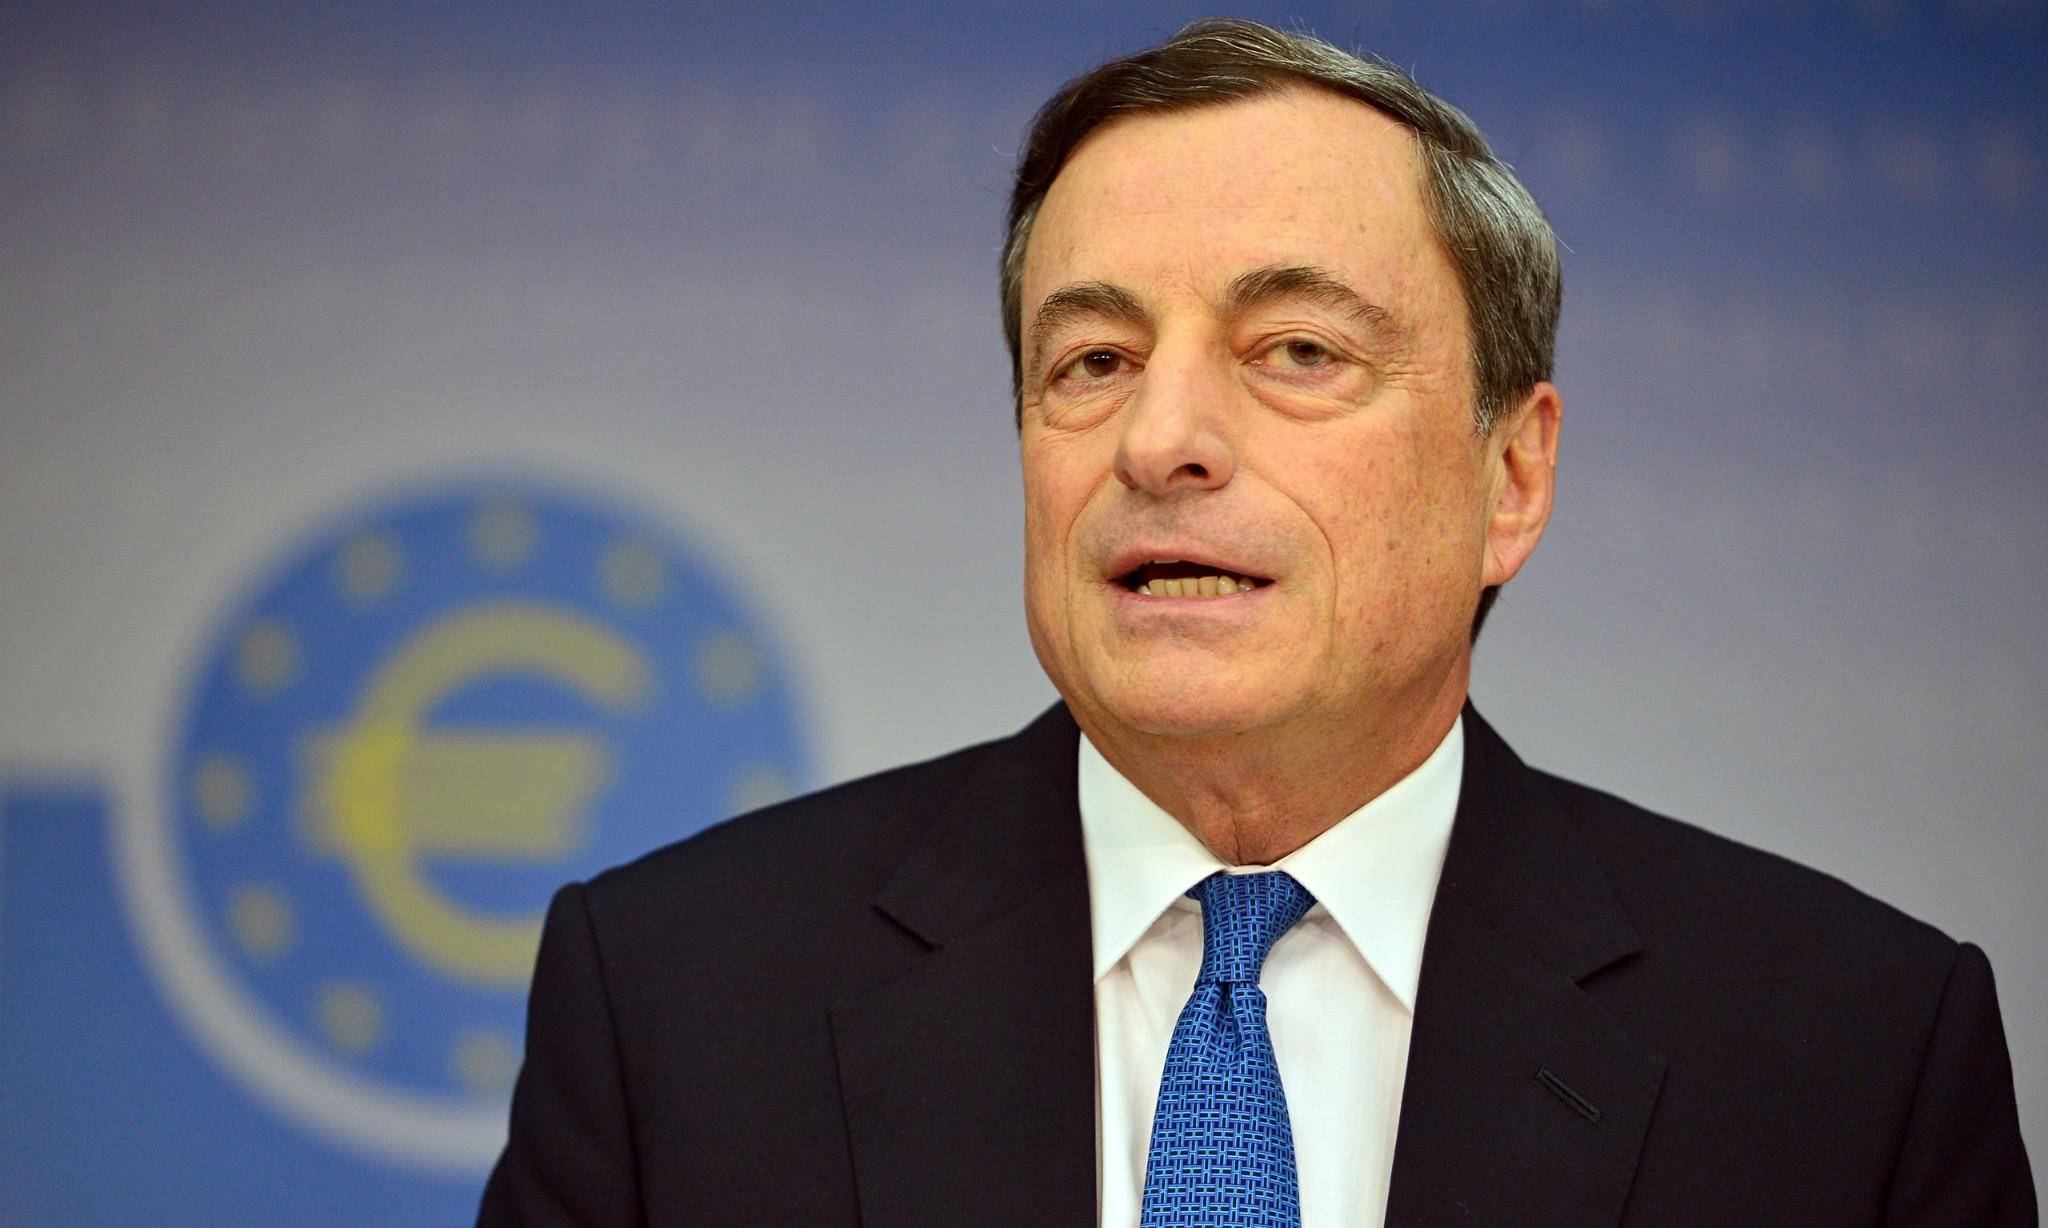 ECB could pump €1tn into eurozone in fresh round of quantitative easing